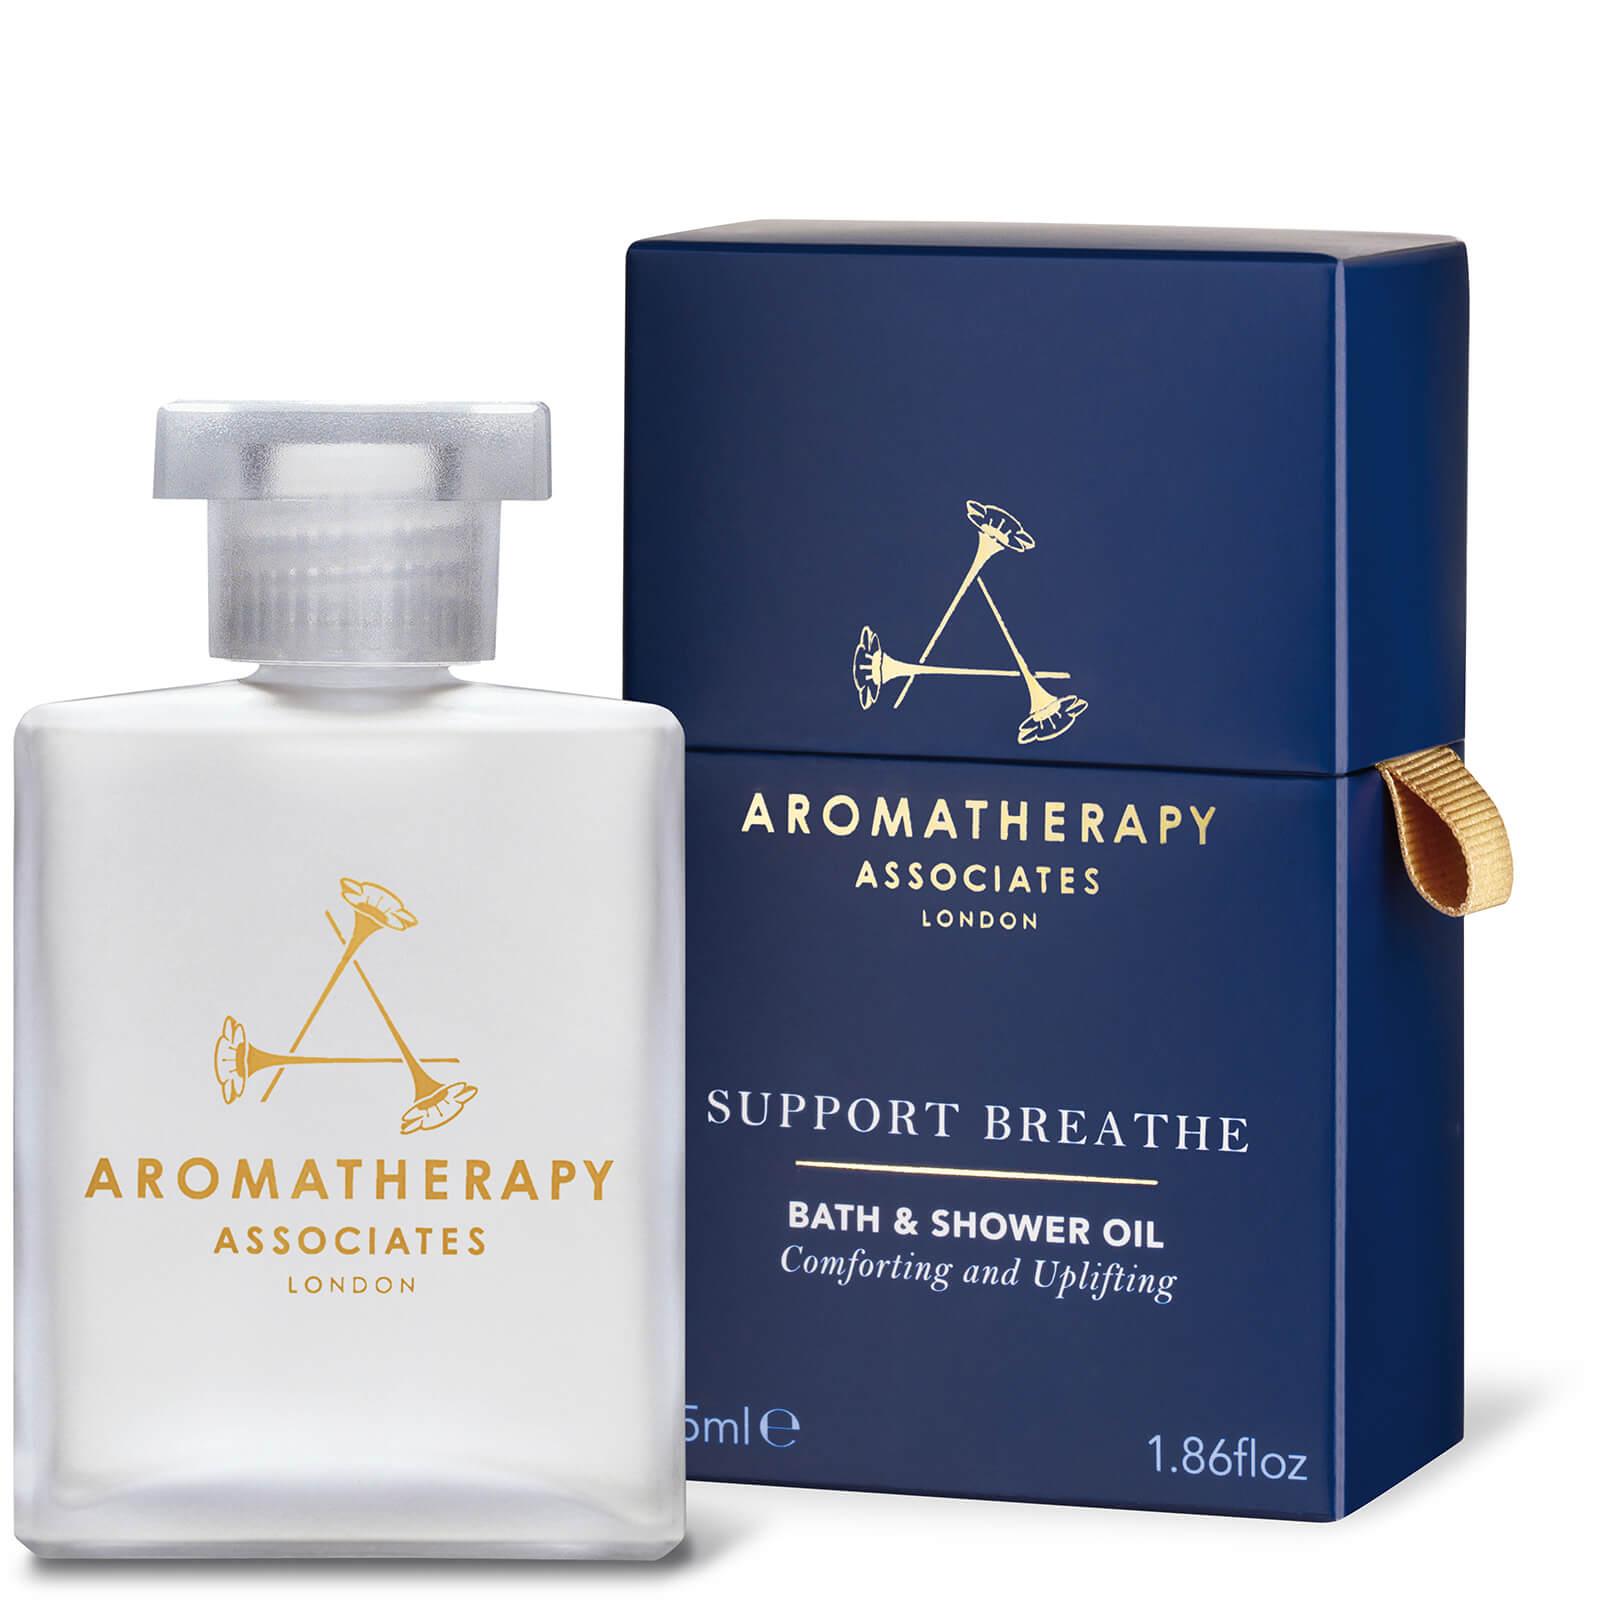 Aromatherapy Associates Support Breathe Bath & Shower Oil 1.8oz